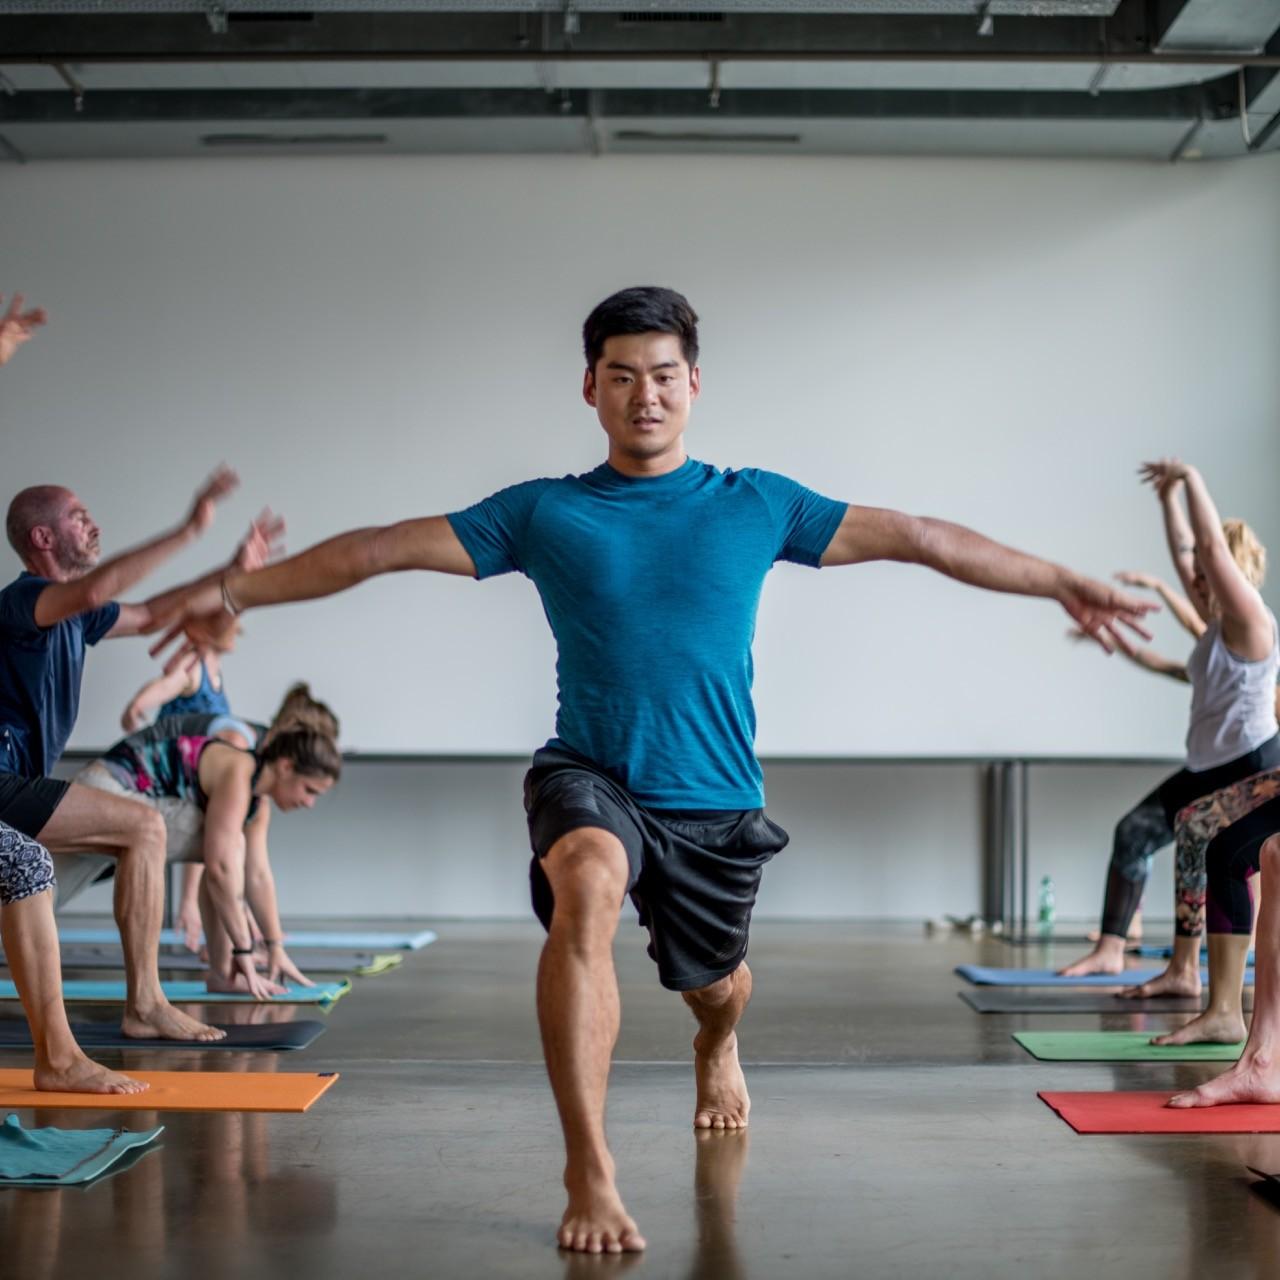 Hie-Kim-Friends-2018-Yoga-Retreat-Alina-Matis-Photography-040 - Hie Kim Yoga - Yoga Retreat - Yoga Workshops und Reisen